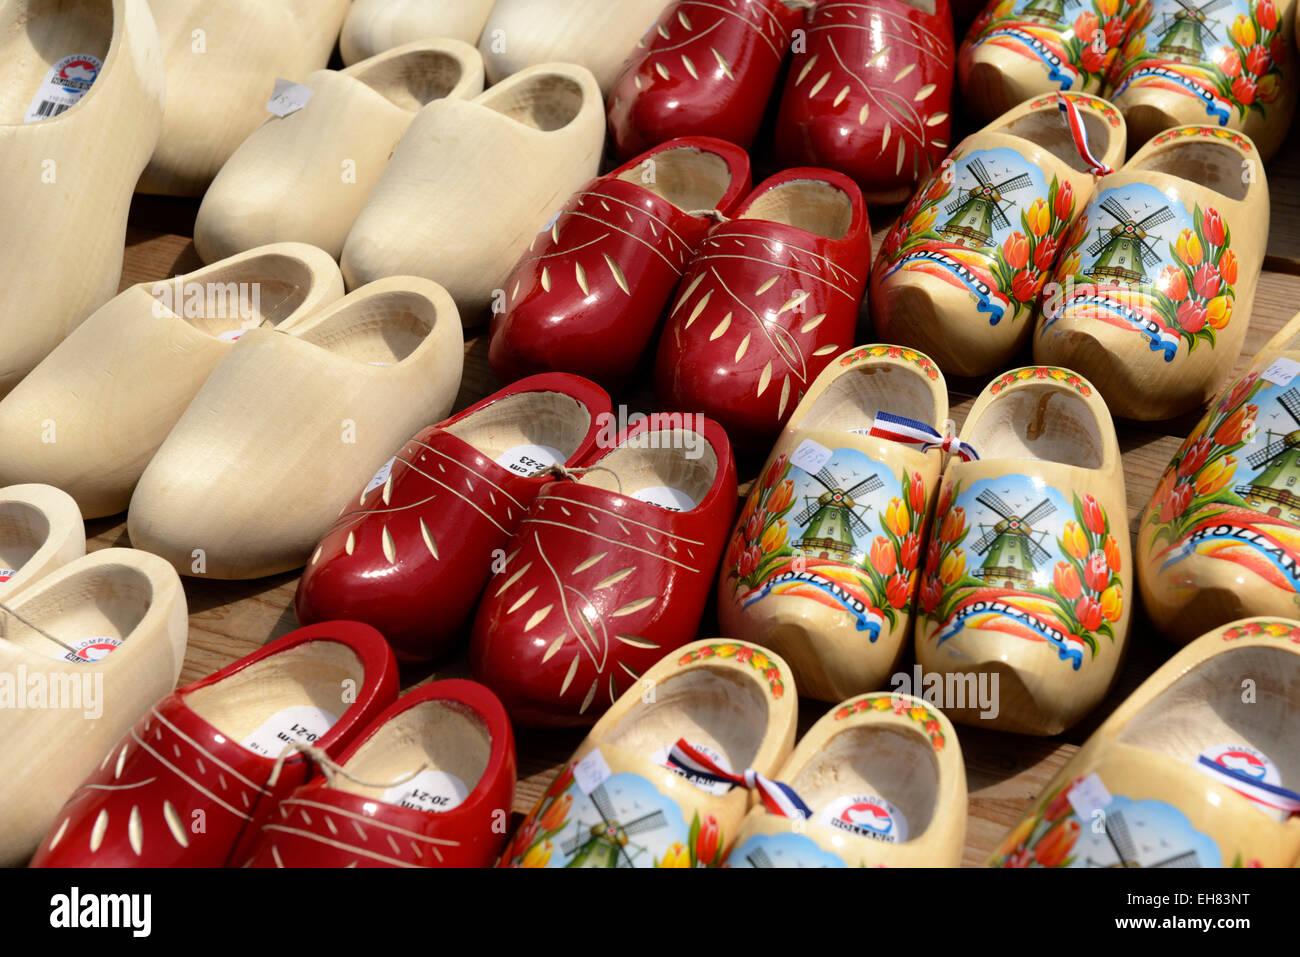 Dipinti olandesi tradizionali zoccoli di legno, Waagplein Square, Alkmaar, North Holland, Paesi Bassi, Europa Immagini Stock